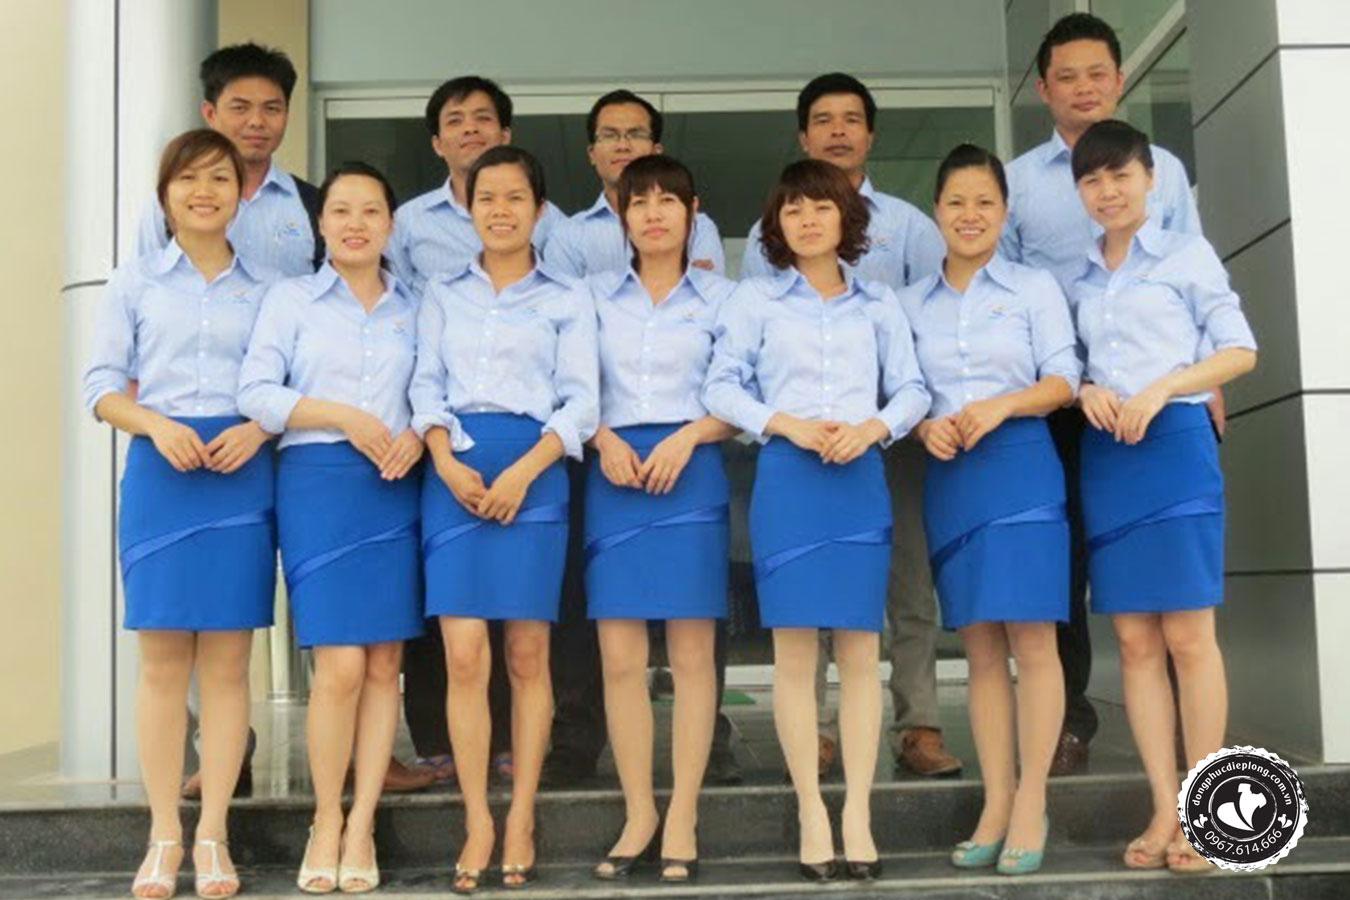 dong-phuc-so-mi-cong-so-can-thiet-ke-an-tuong-chat-luong-thuong-hang